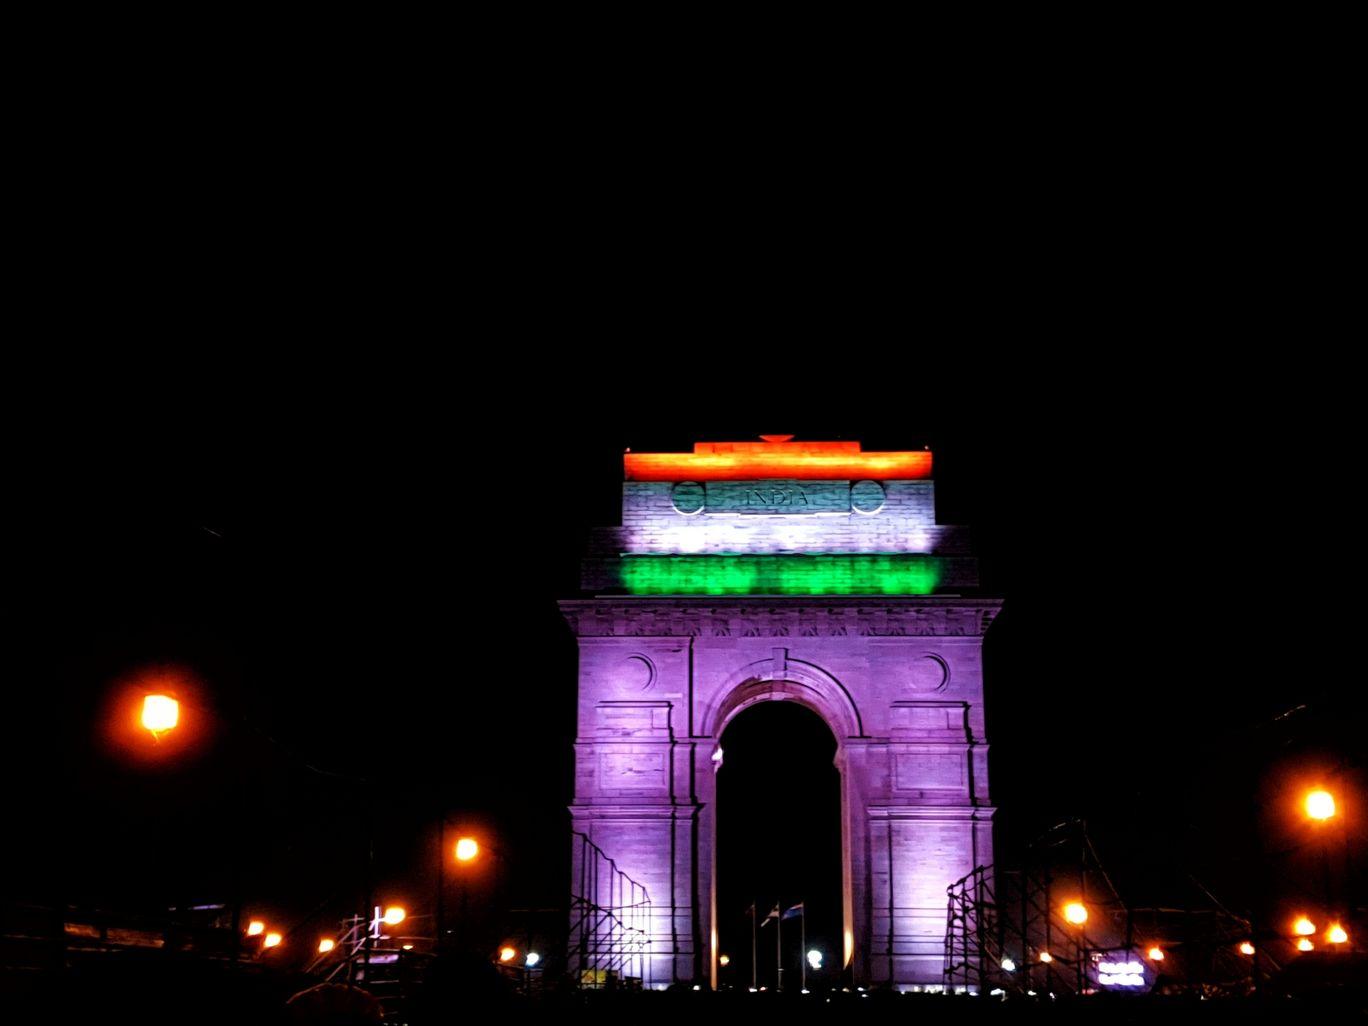 Photo of India Gate By S S (Saurabh Sabikhi)